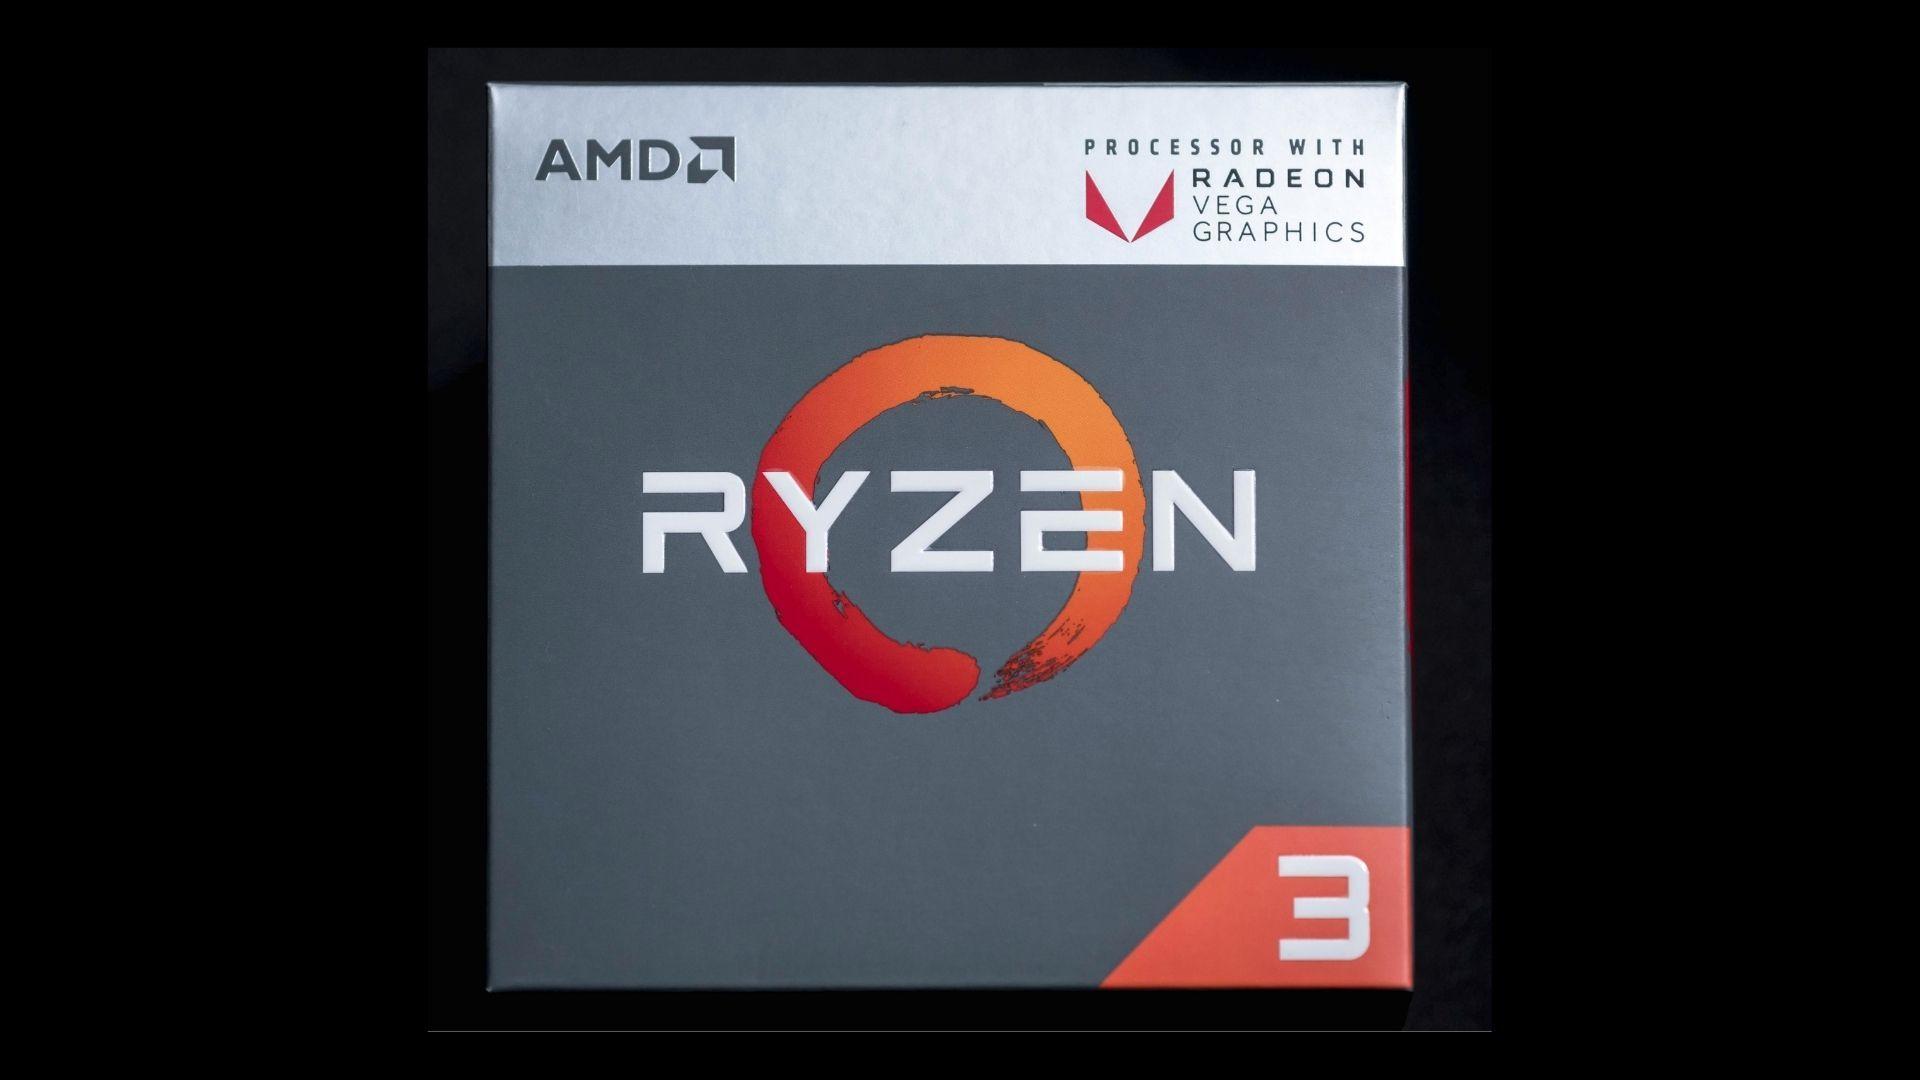 Caixa do processador AMD Ryzen 3